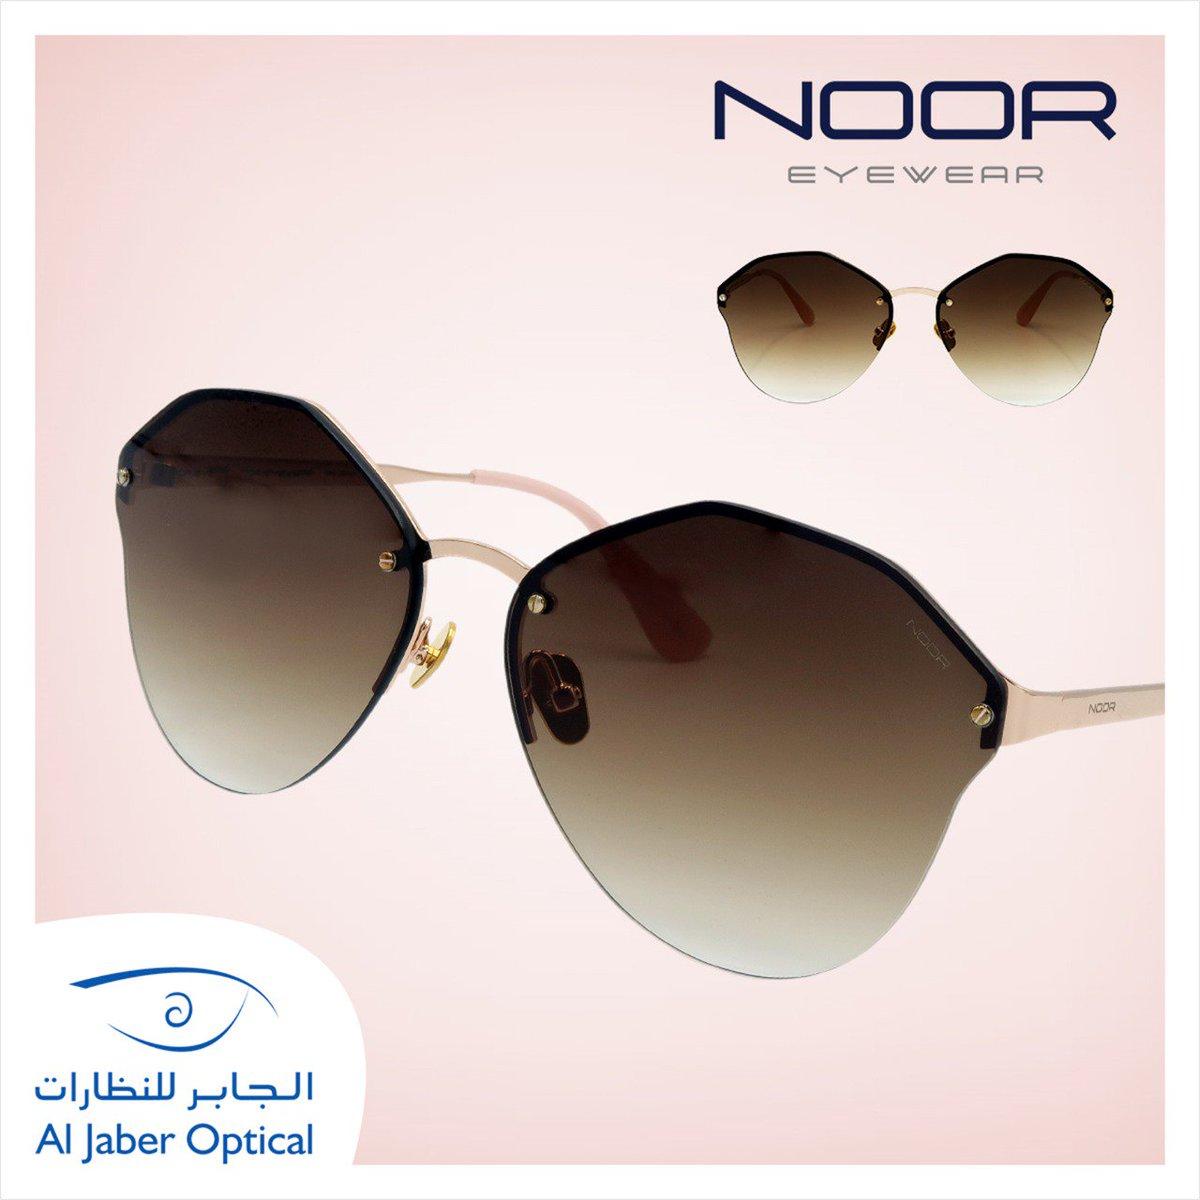 ec034ade79 Al Jaber Optical ( aljaberoptical)